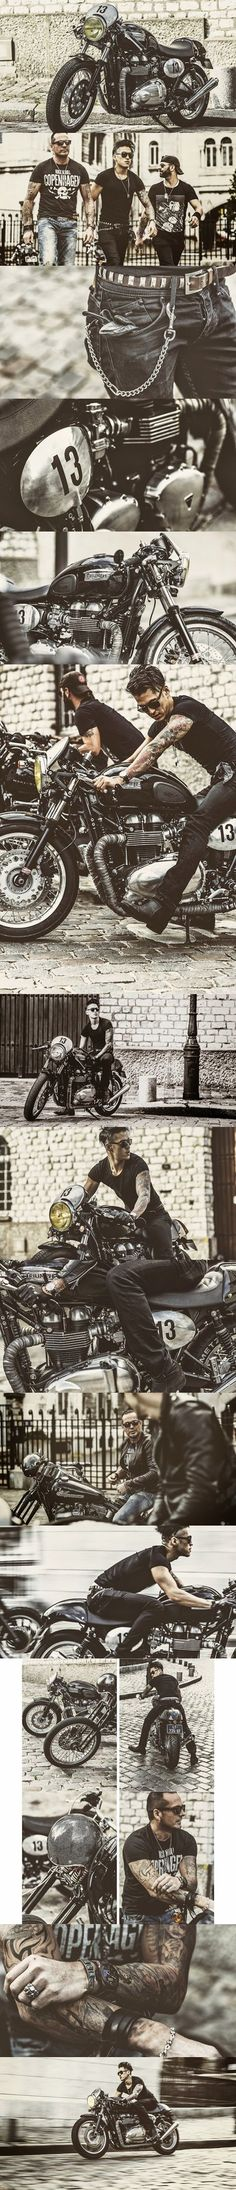 Triumph The Three Horsemen Men's Bike Series July 2014https://www.behance.net/gallery/The-Three-Horsemen/12195489 --- caferacer #motorcycles #motos | caferacerpasion.com